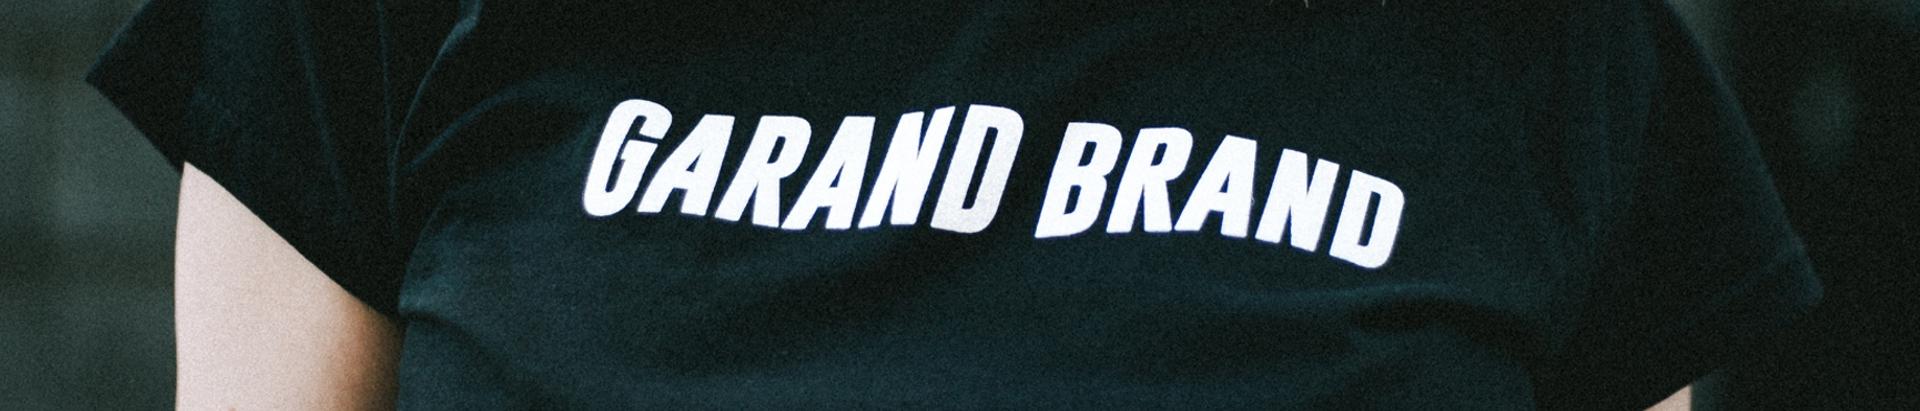 garand brand basic logo